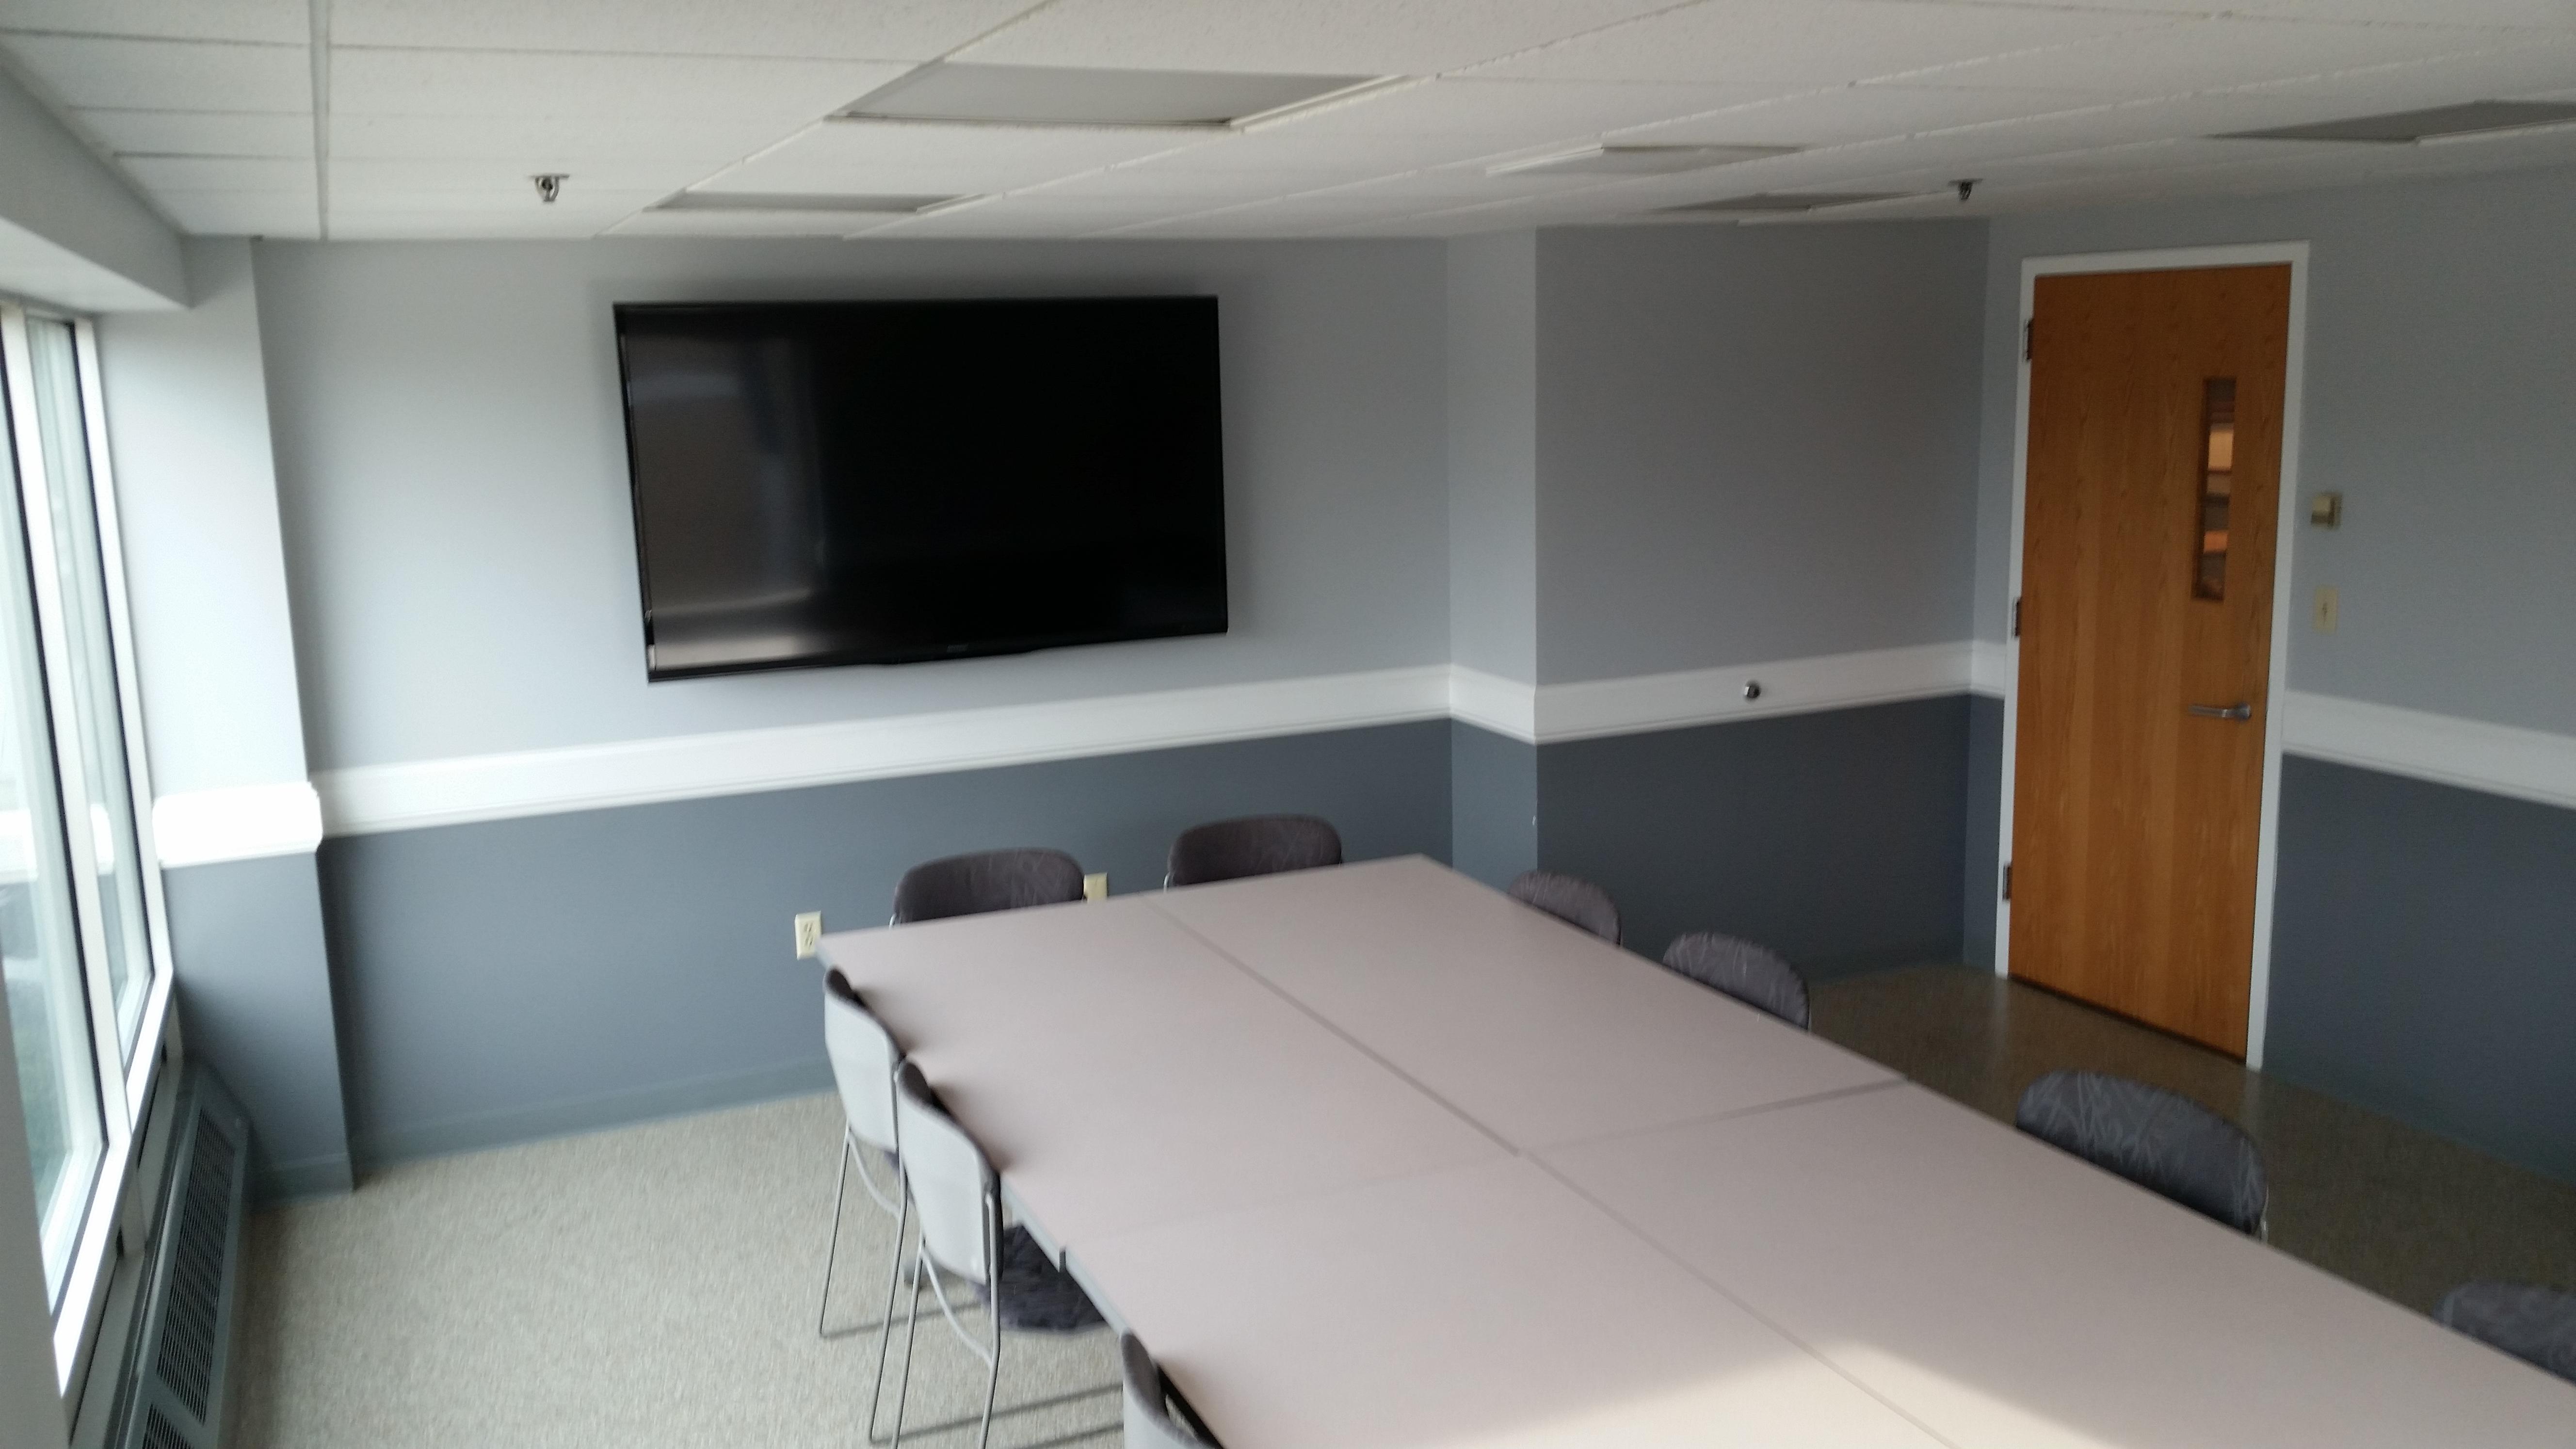 DDC Room 202 / 204